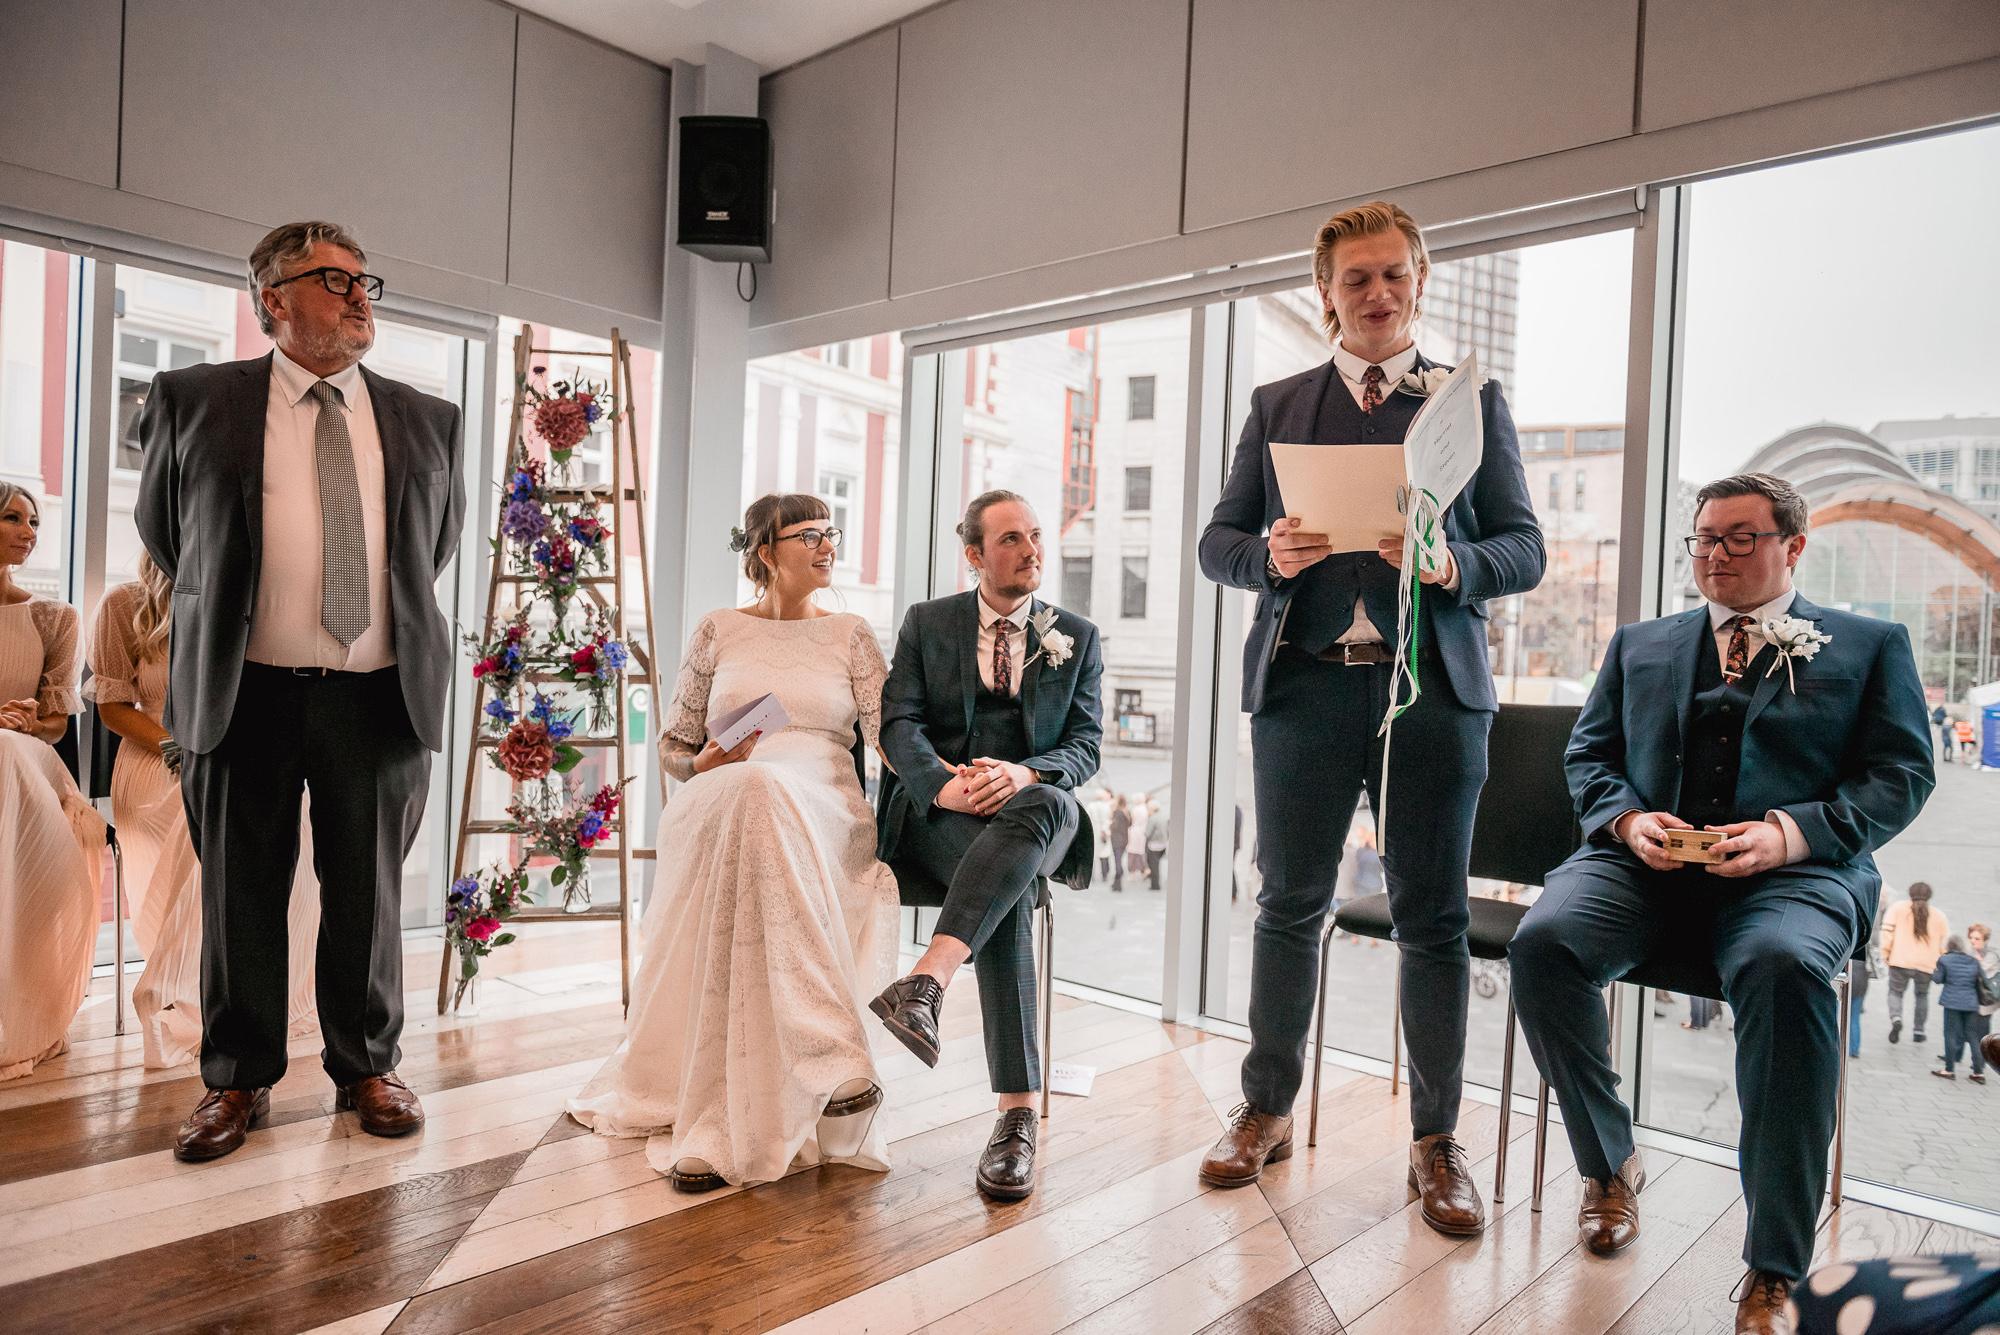 Harriet-Dahlia-Bespoke-Lace-Silk-Bohemian-Wedding-Dress-Sleeves-Tattooed-Bride-Alternative-Wedding-Sheffield-6.jpg